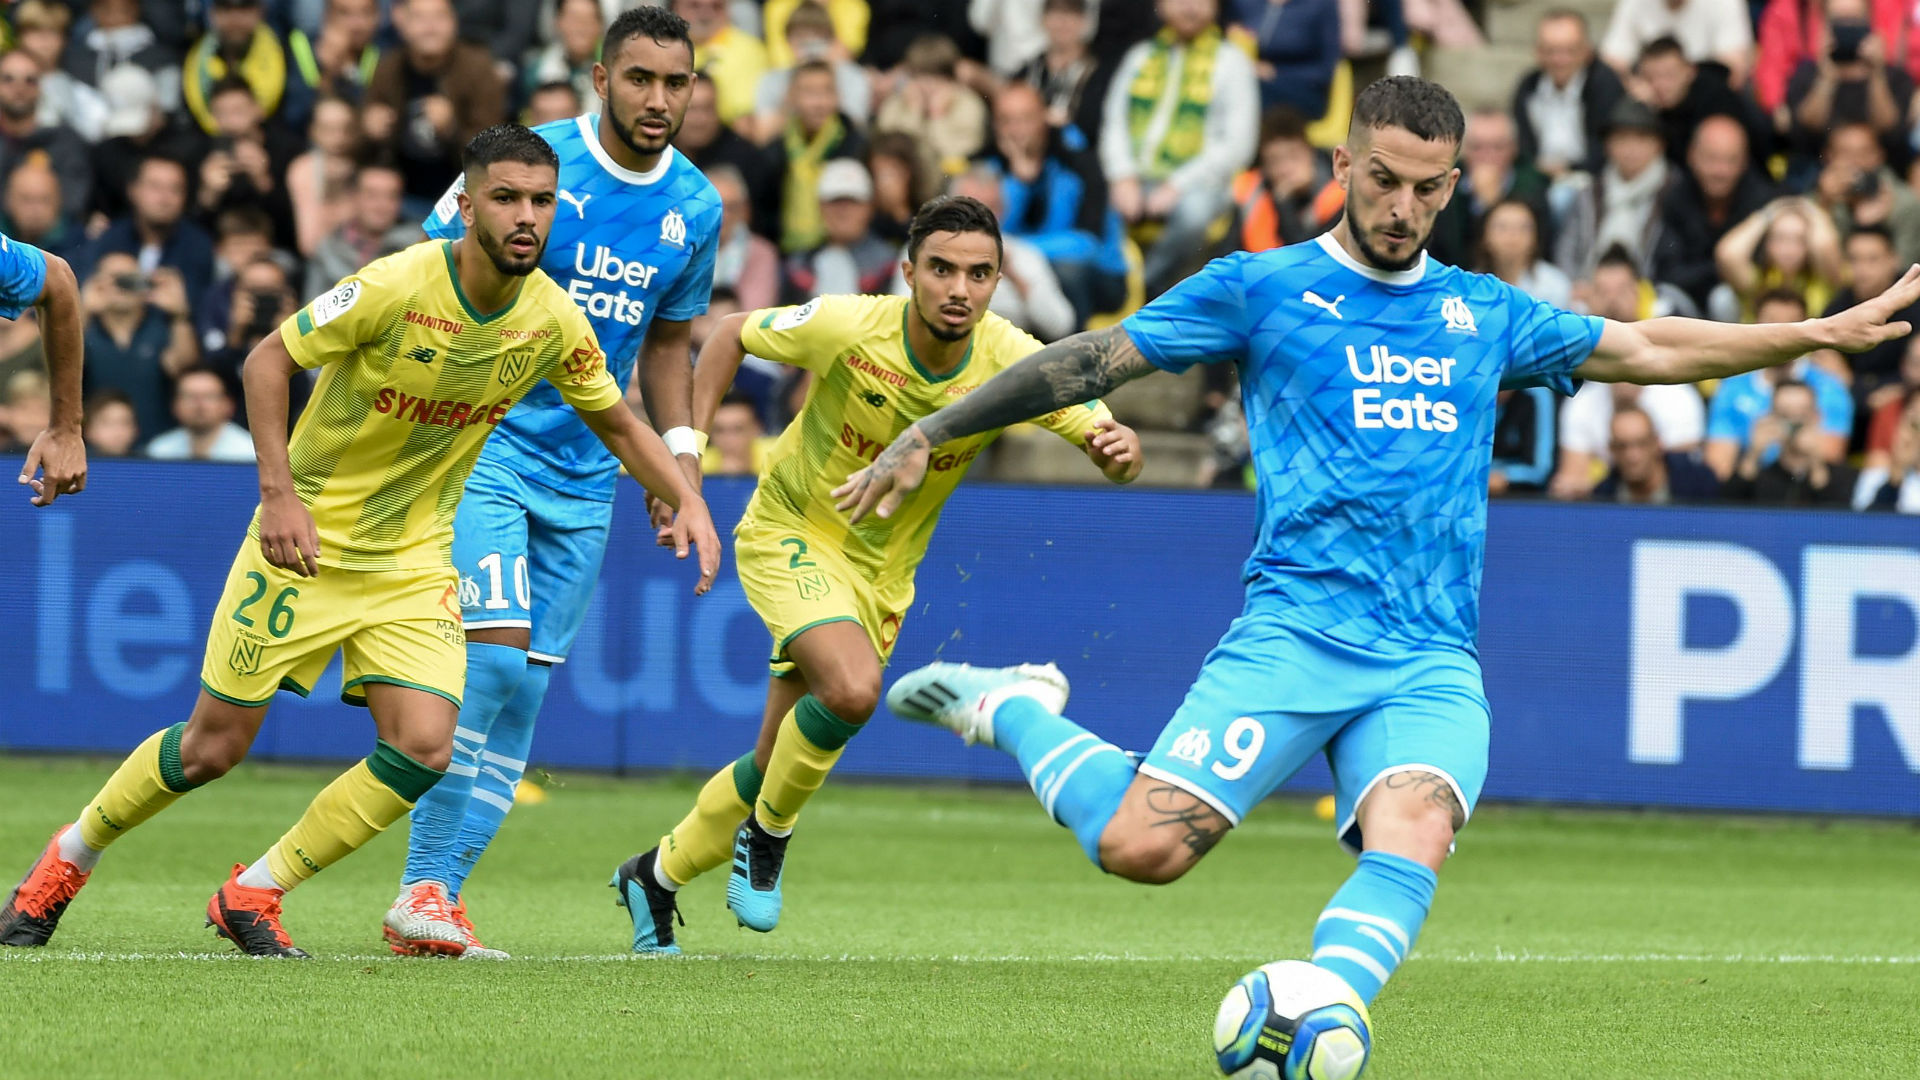 Nantes - OM (0-0) - Benedetto et l'OM restent à l'arrêt